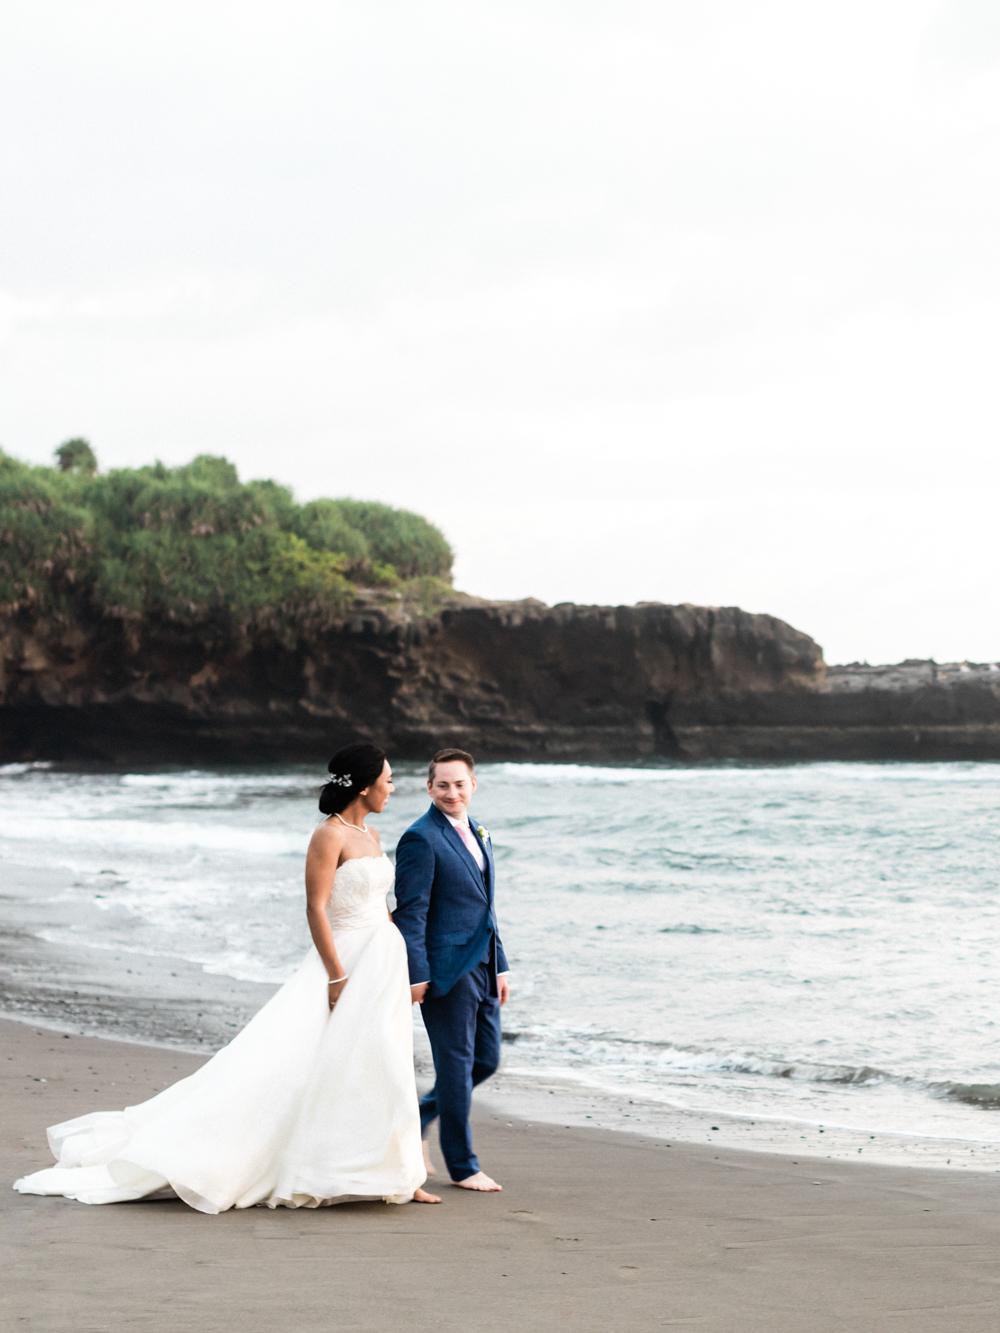 Bali_Real_Wedding_(c)_Rory_Wylie-108.jpg